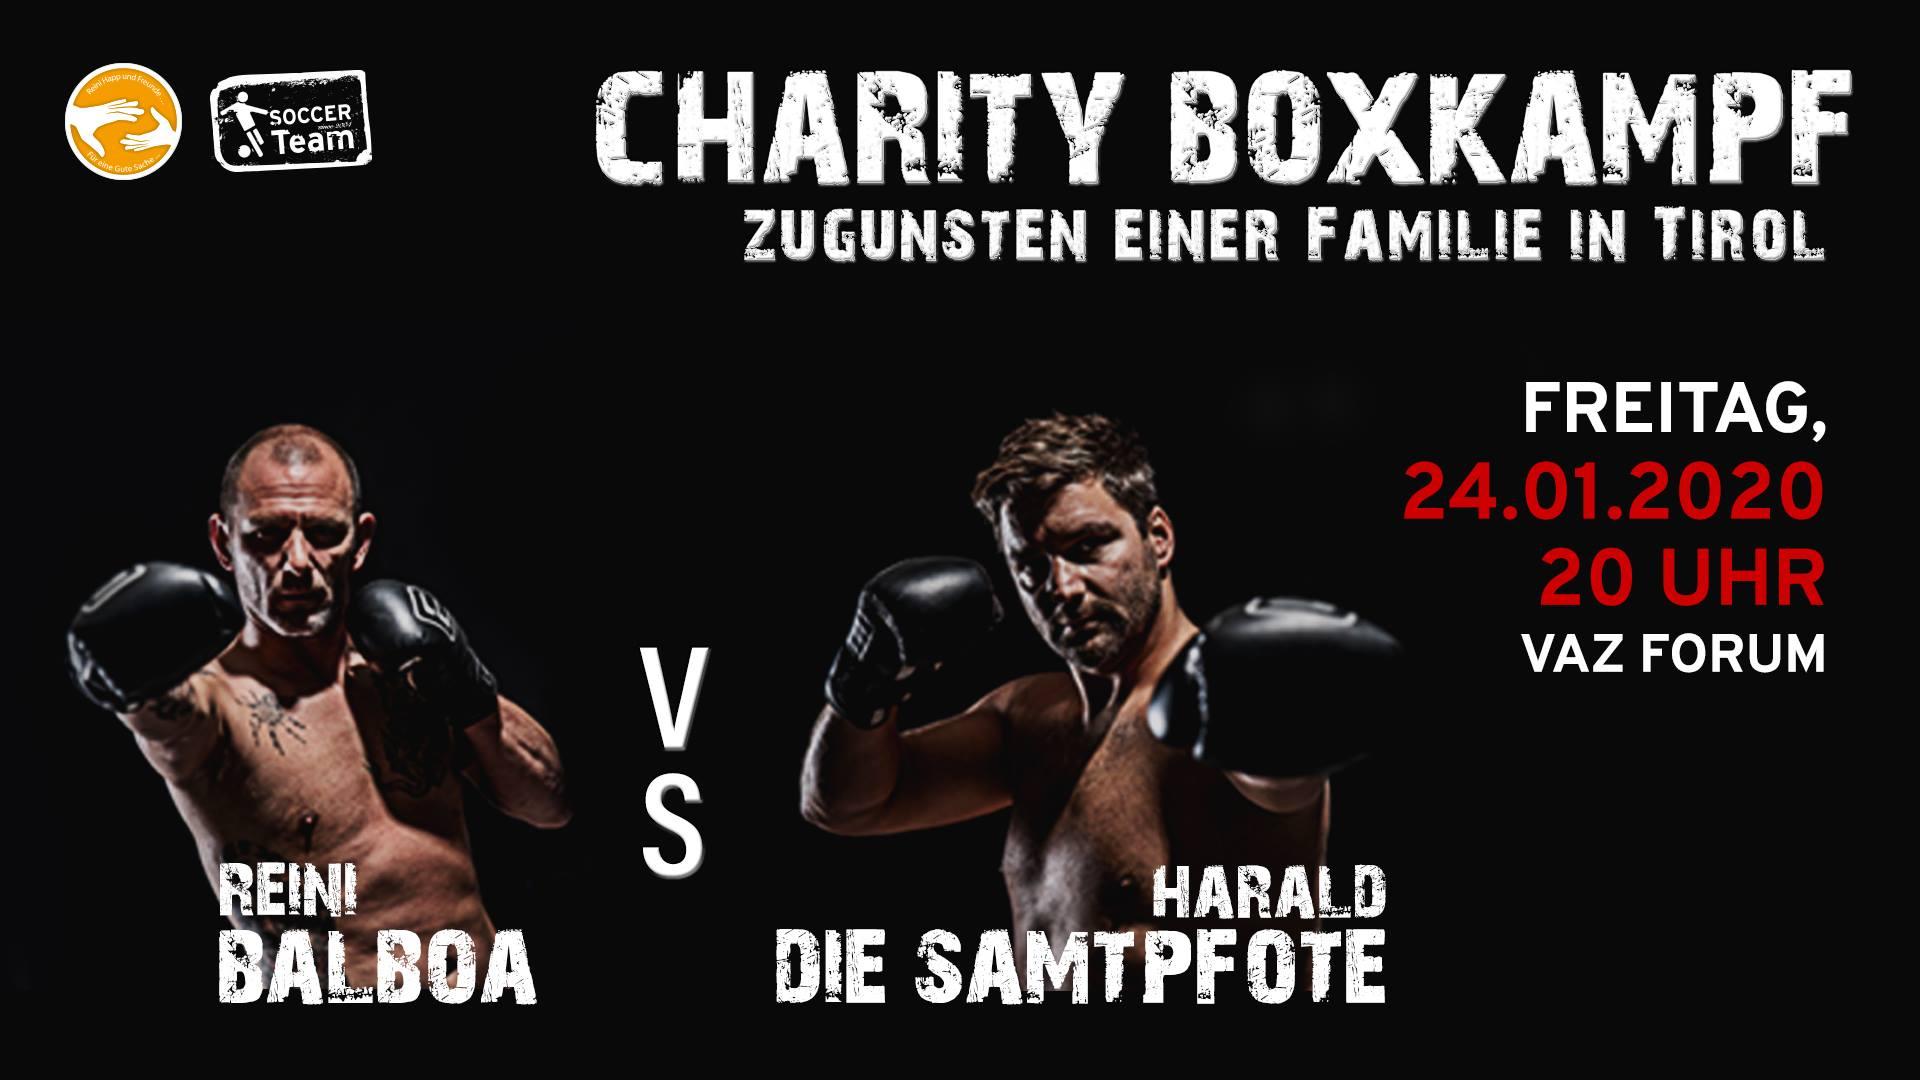 Charity Boxkampf / Forum in Rum